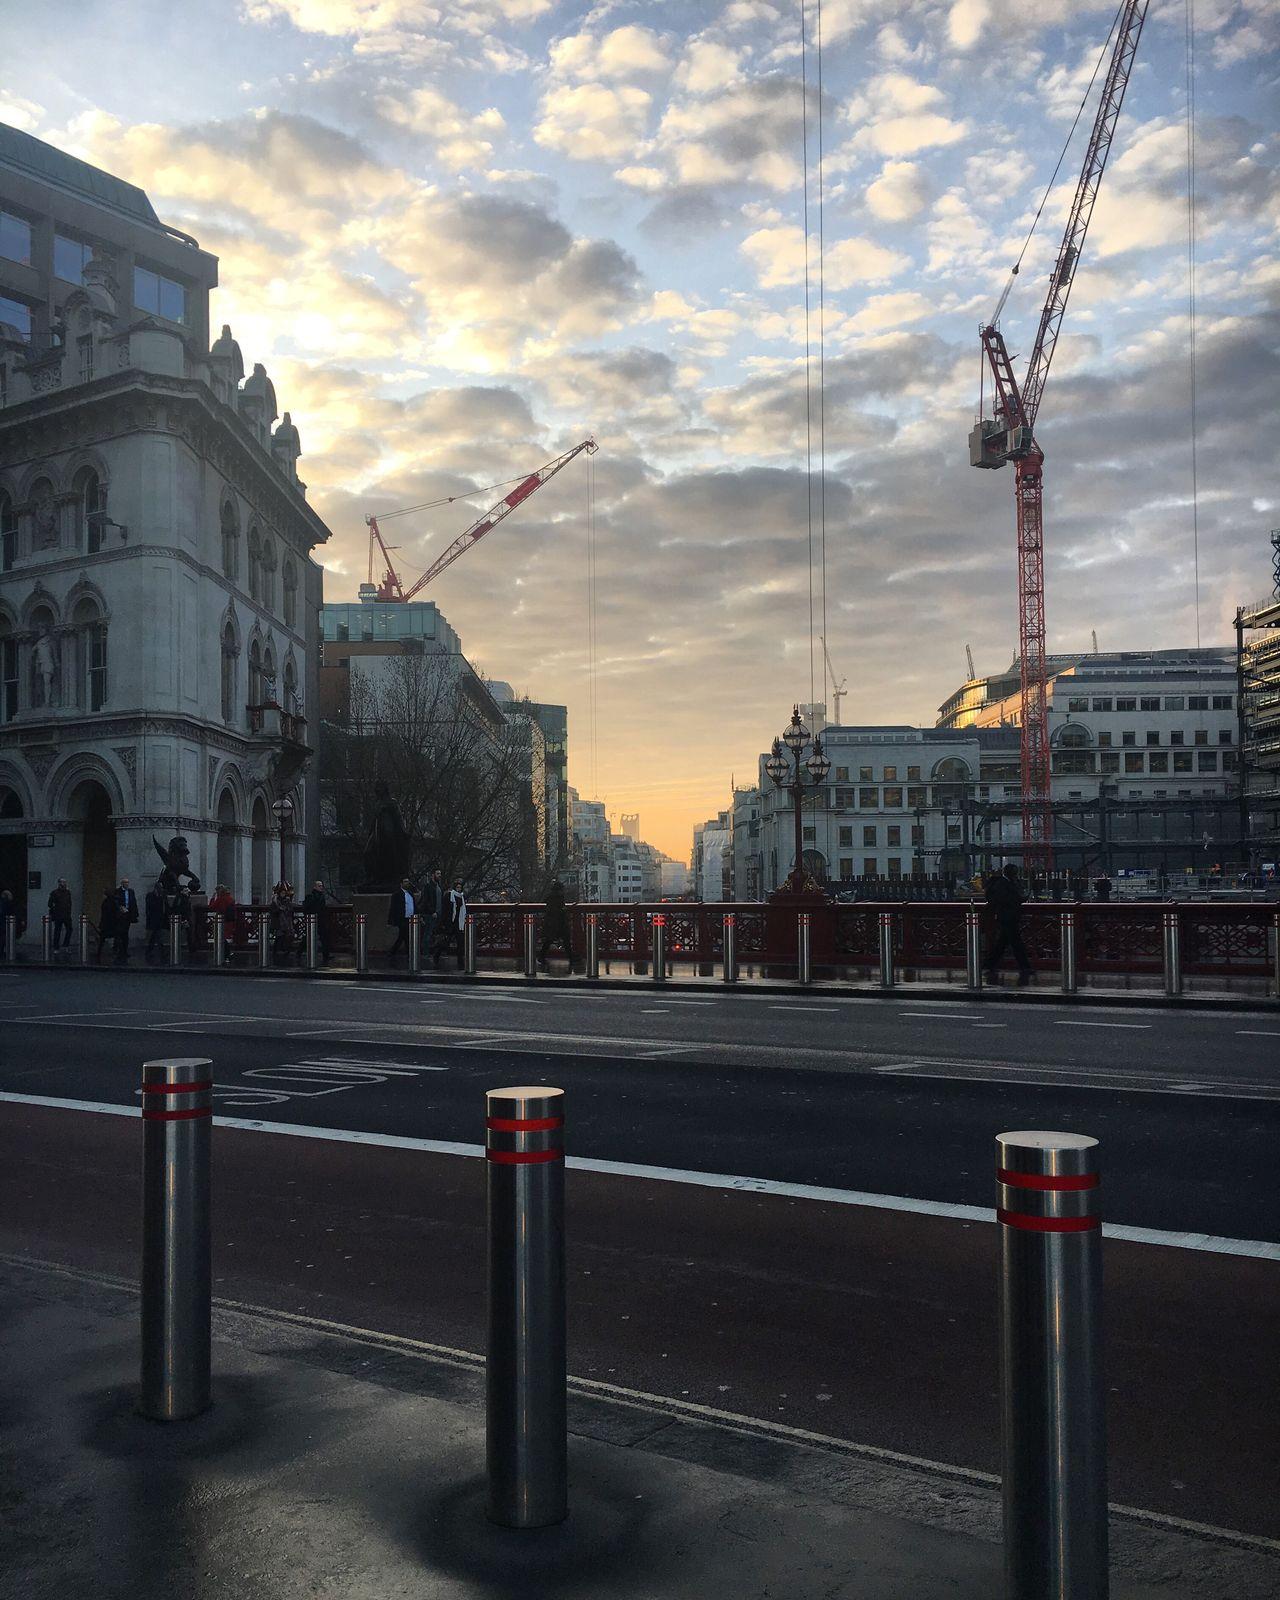 London Holborn Viaduct Cranes Lighting Sunlight Sunset